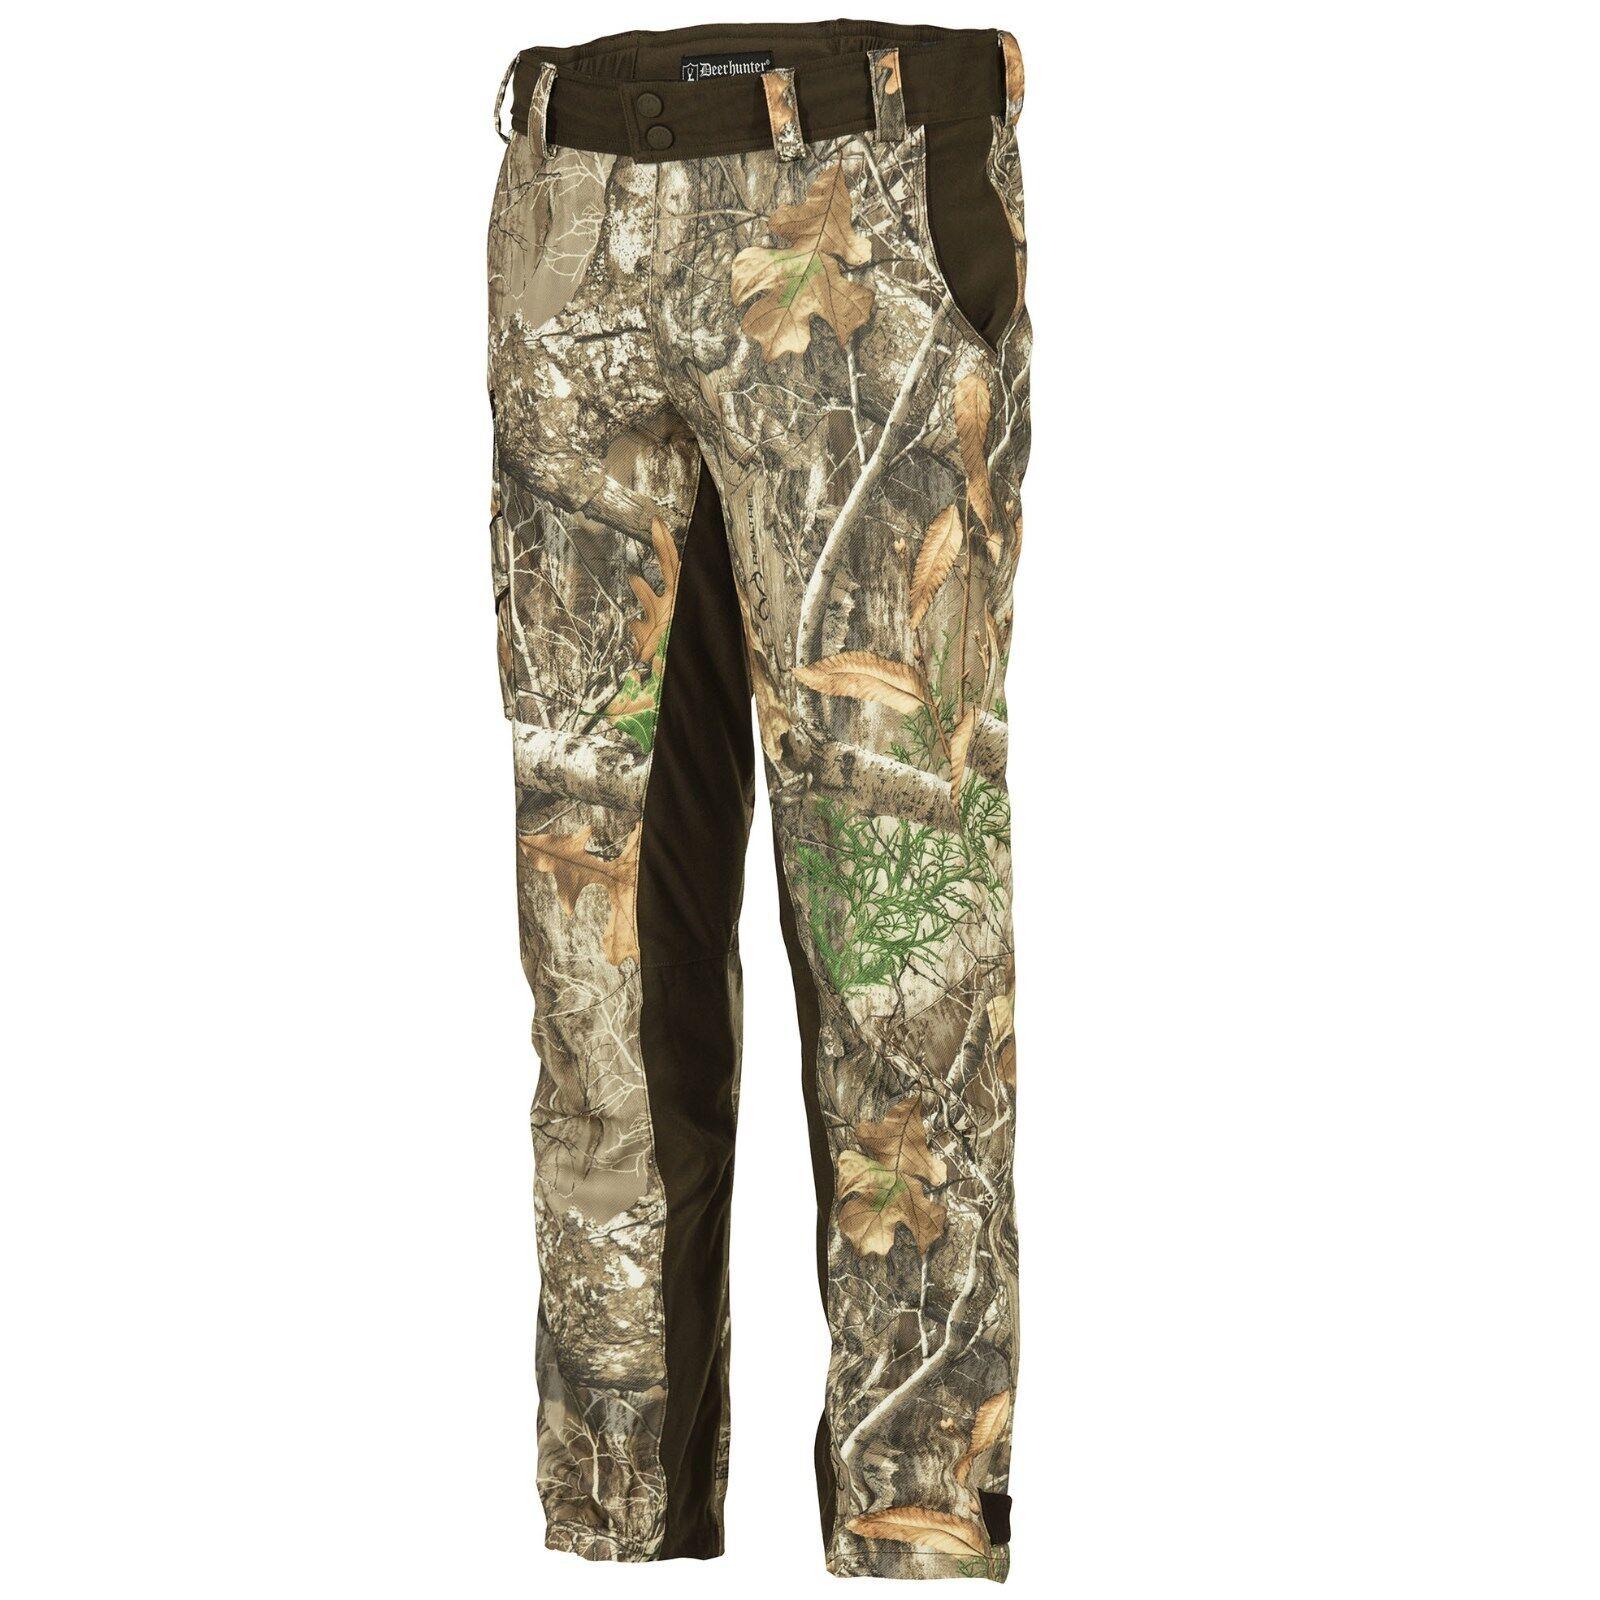 Deerhunter 3830 muflon light pantalones, ligeros pantalones de caza 46-Realtree Edge camo, 48-64